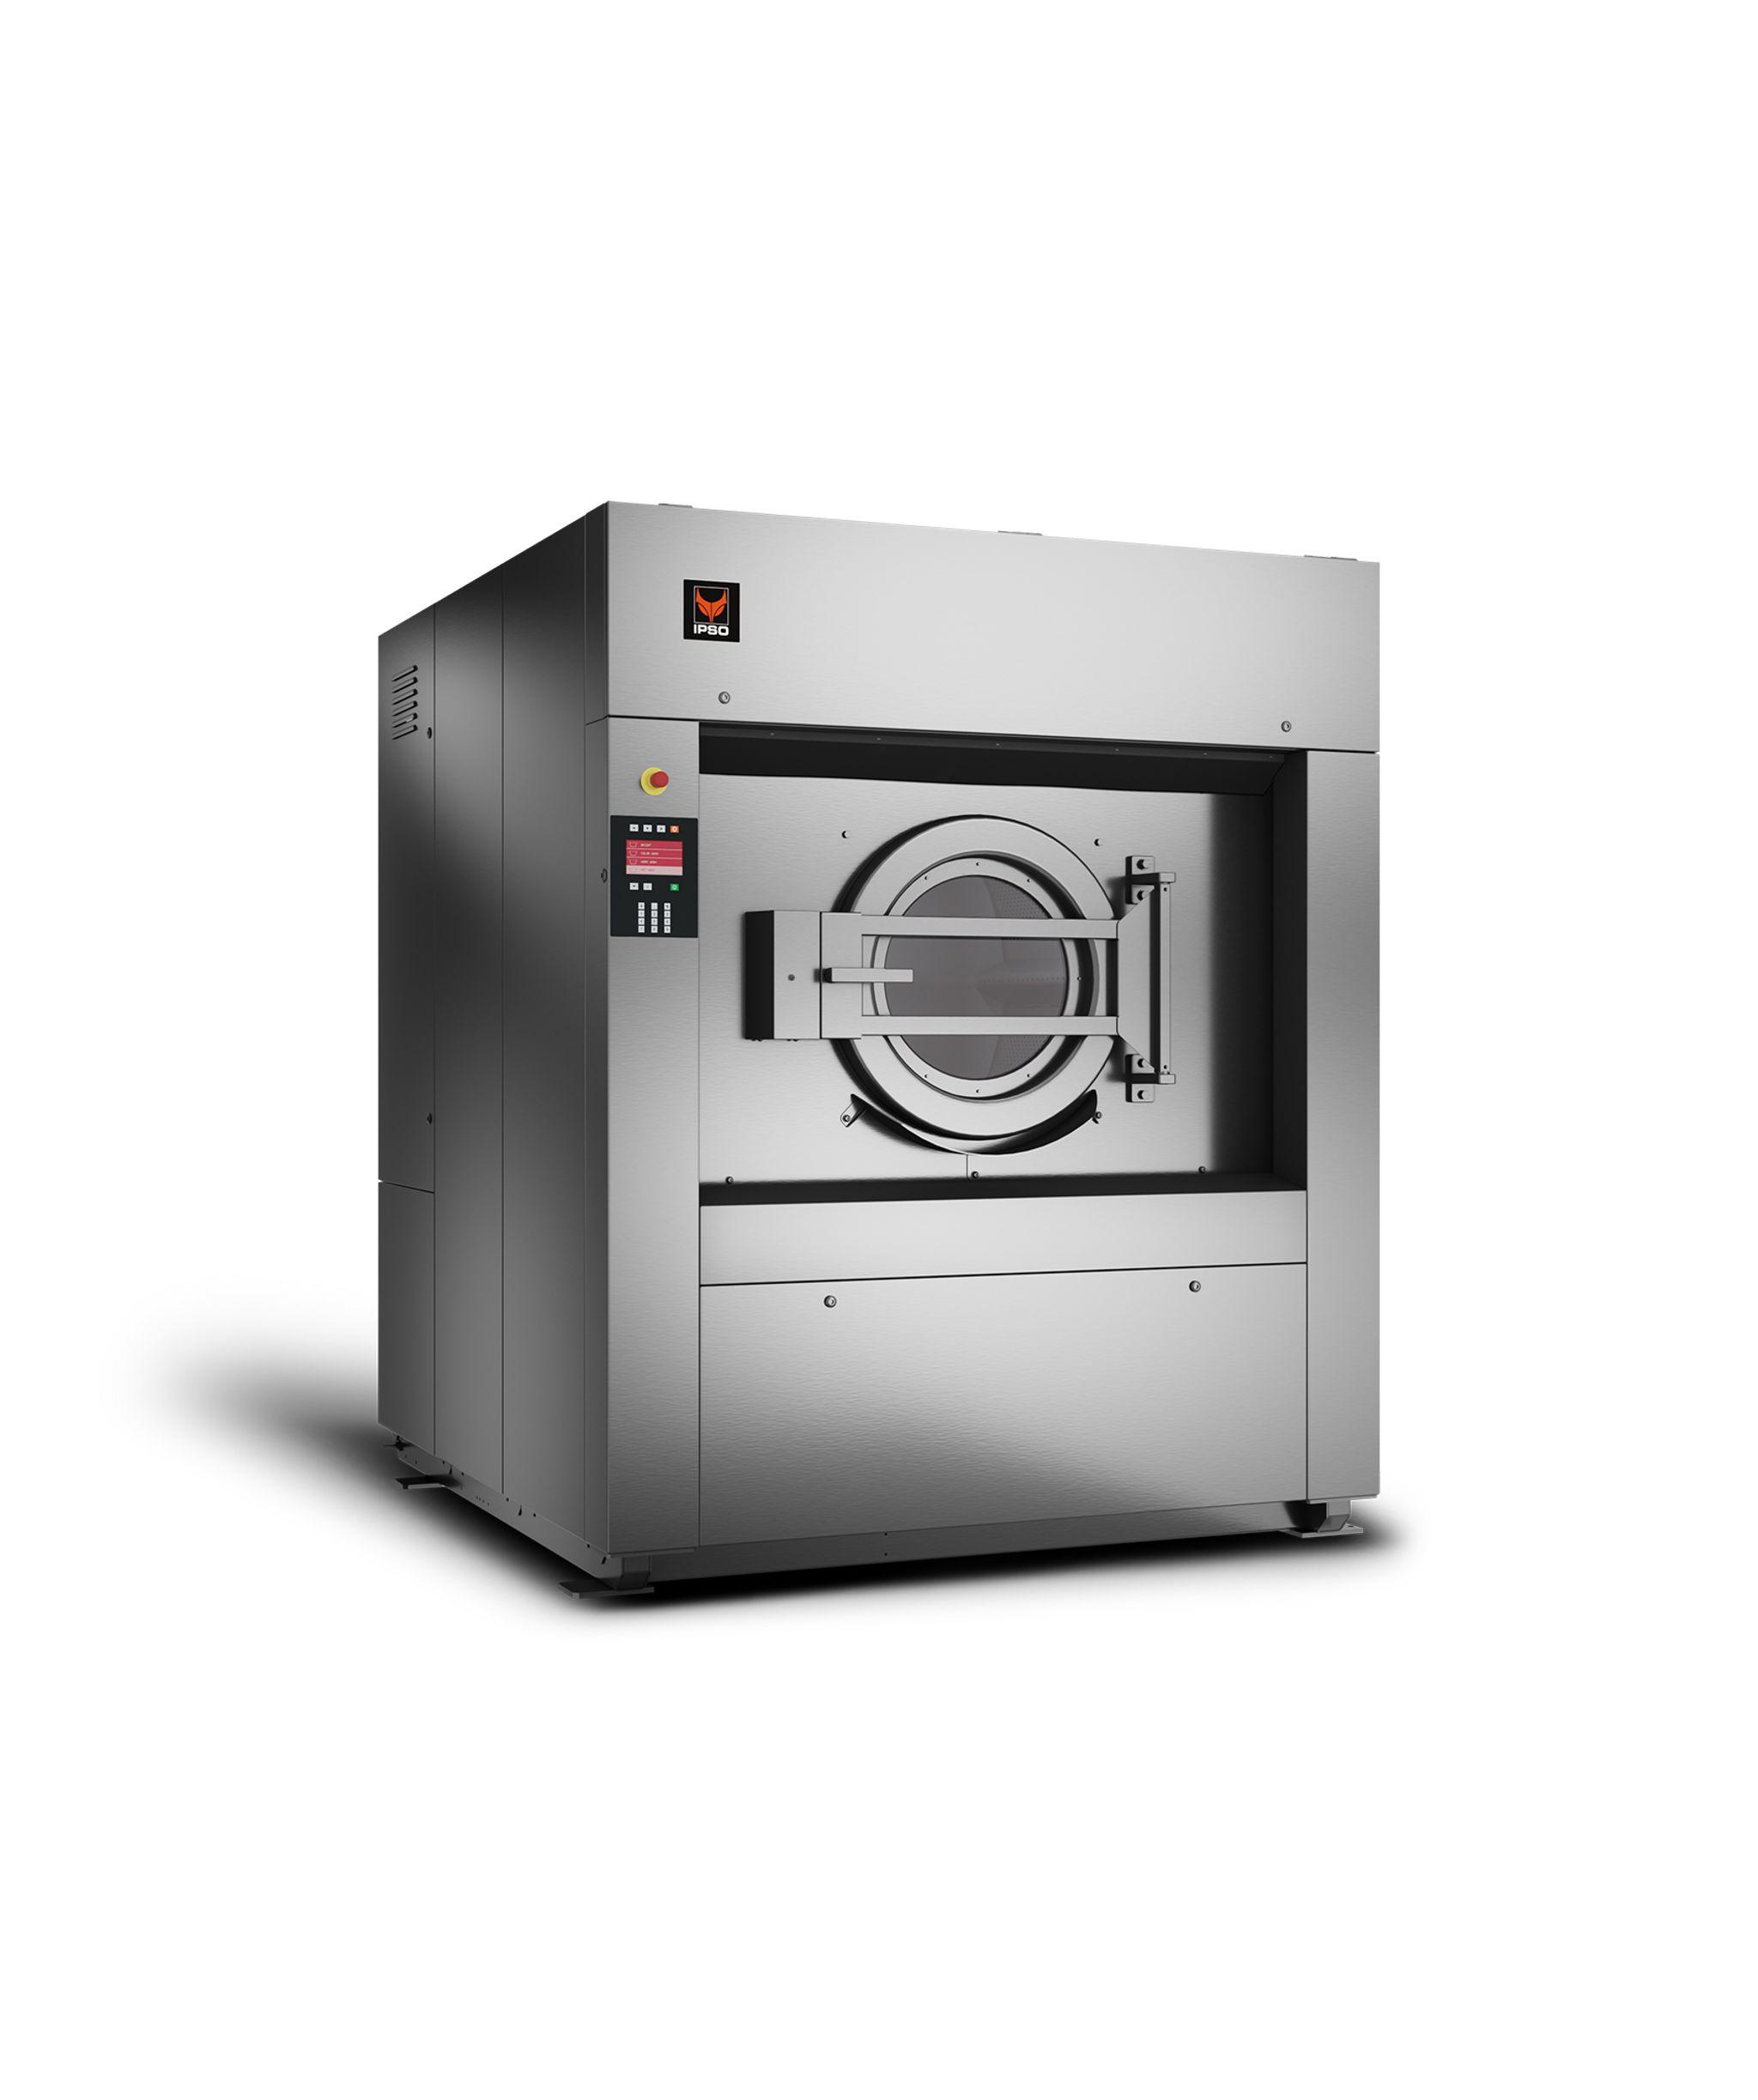 Ipso 80kg Commercial Washer (Ipso IY800) - Veeco Laundry Systems